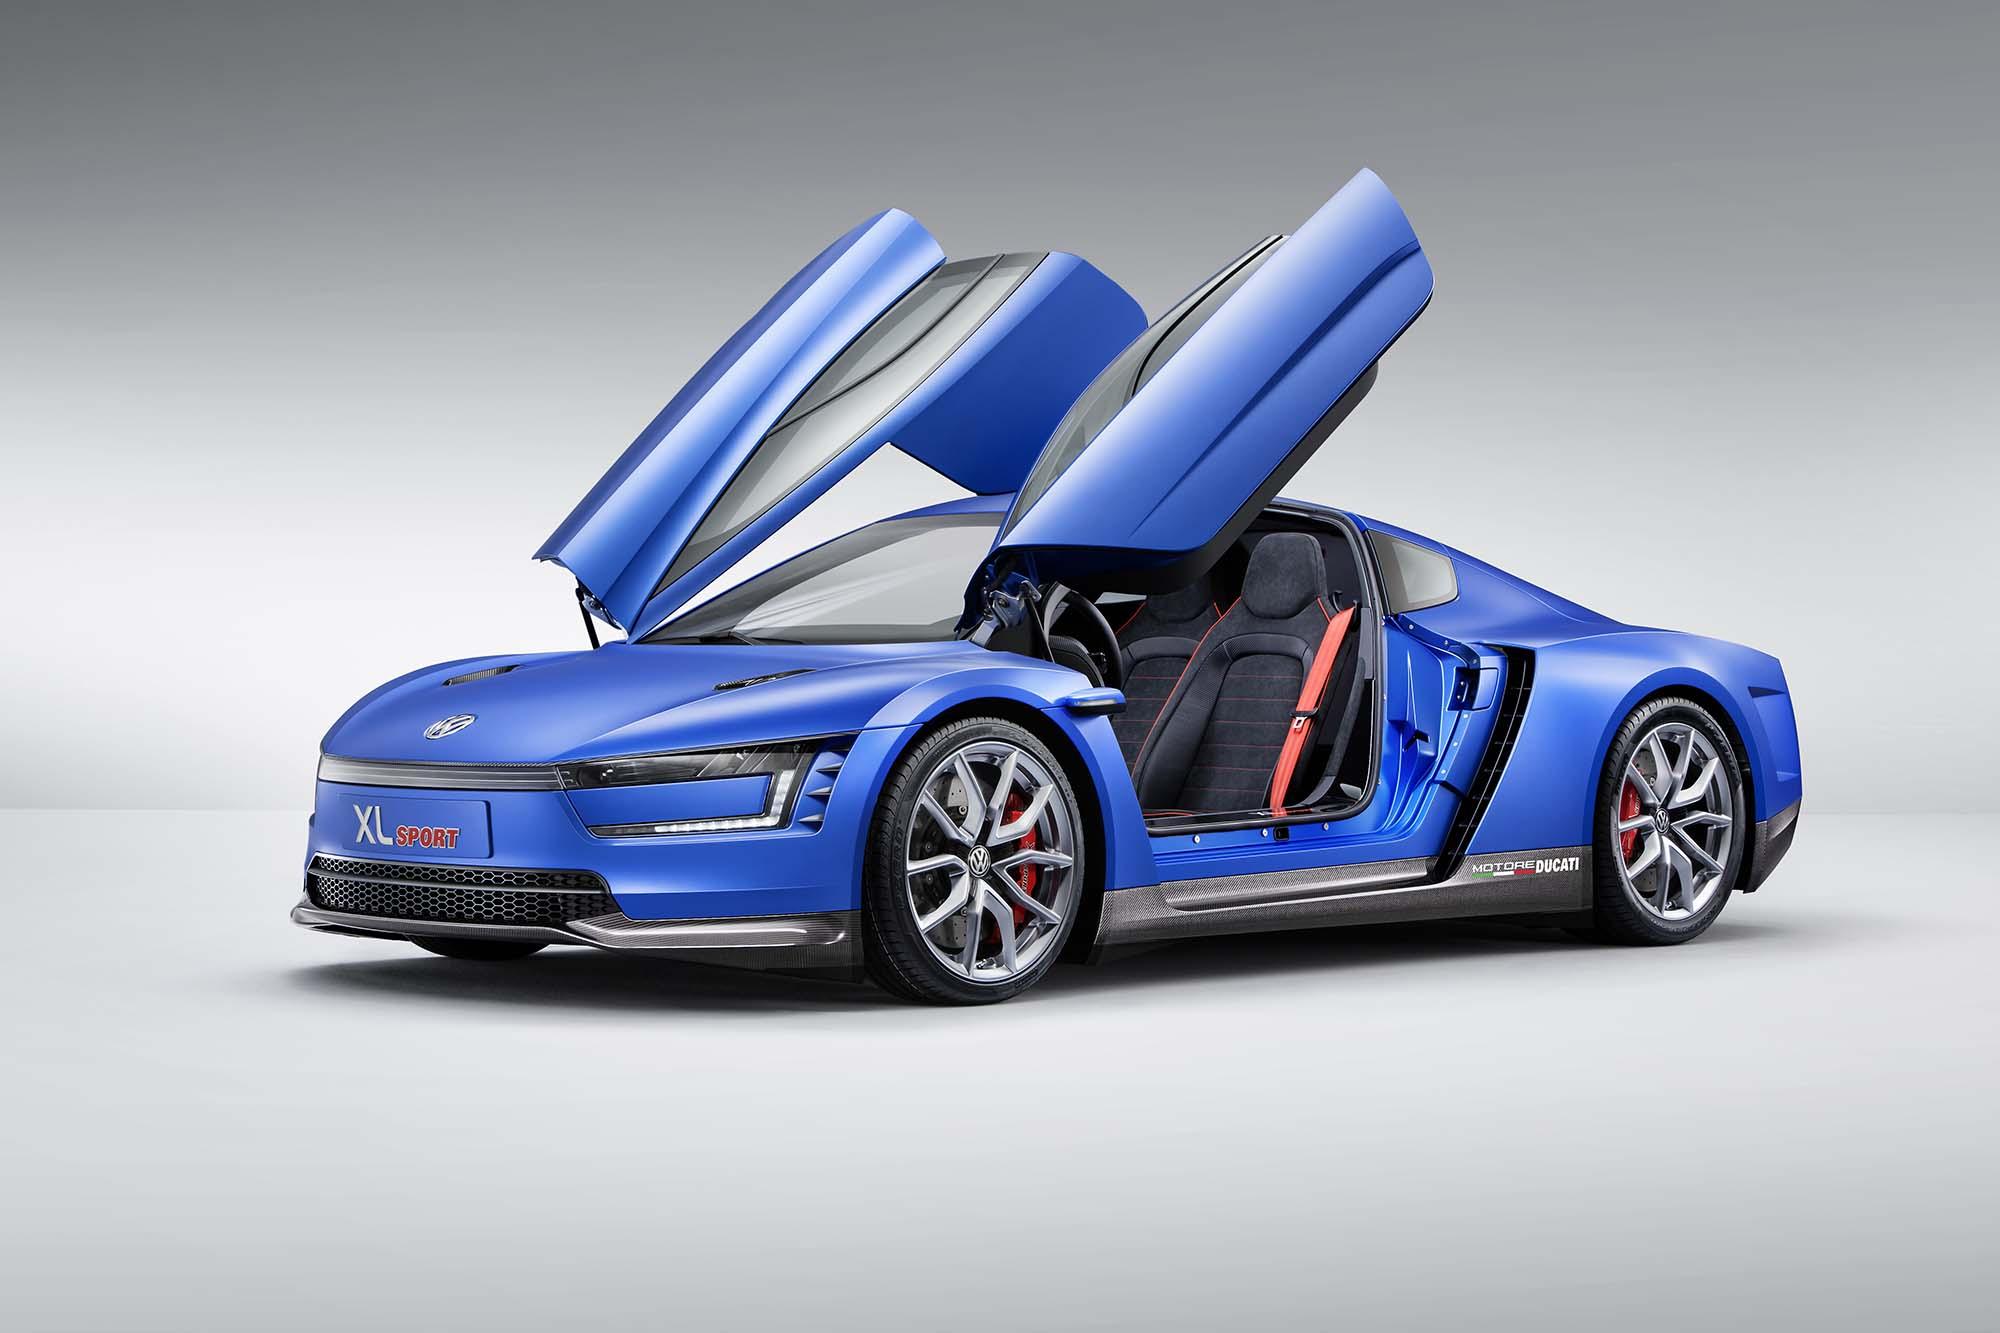 Volkswagen XL Sport - A Ducati Superleggera Powered Car - Asphalt & Rubber